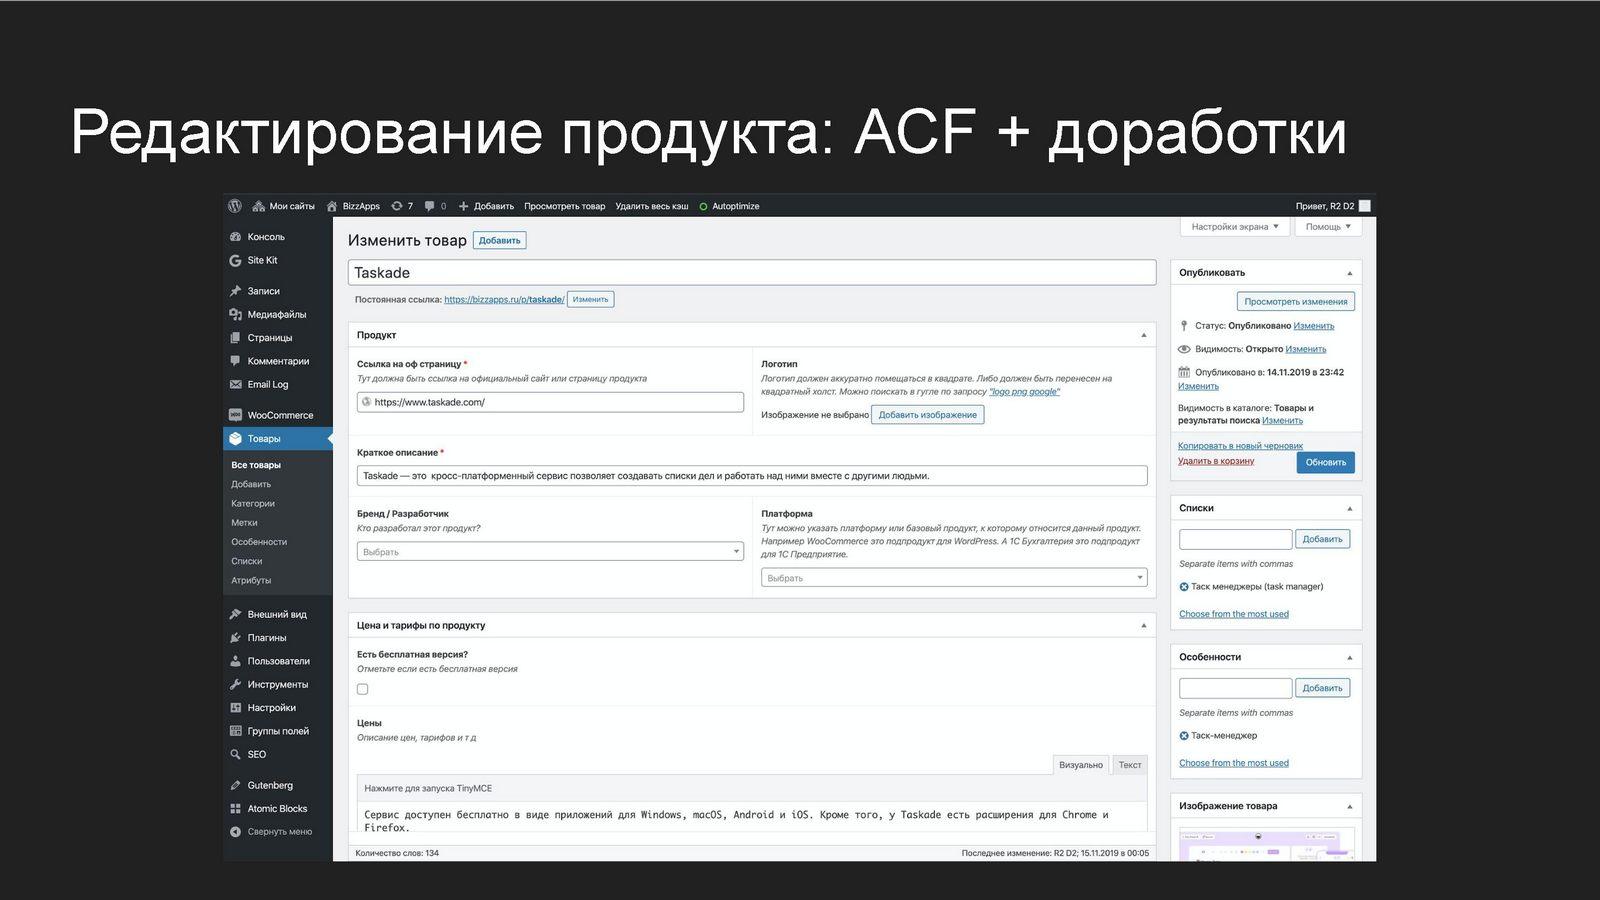 wp10-Анатолий Юмашев-Агрегатор bizzapps.ru 18